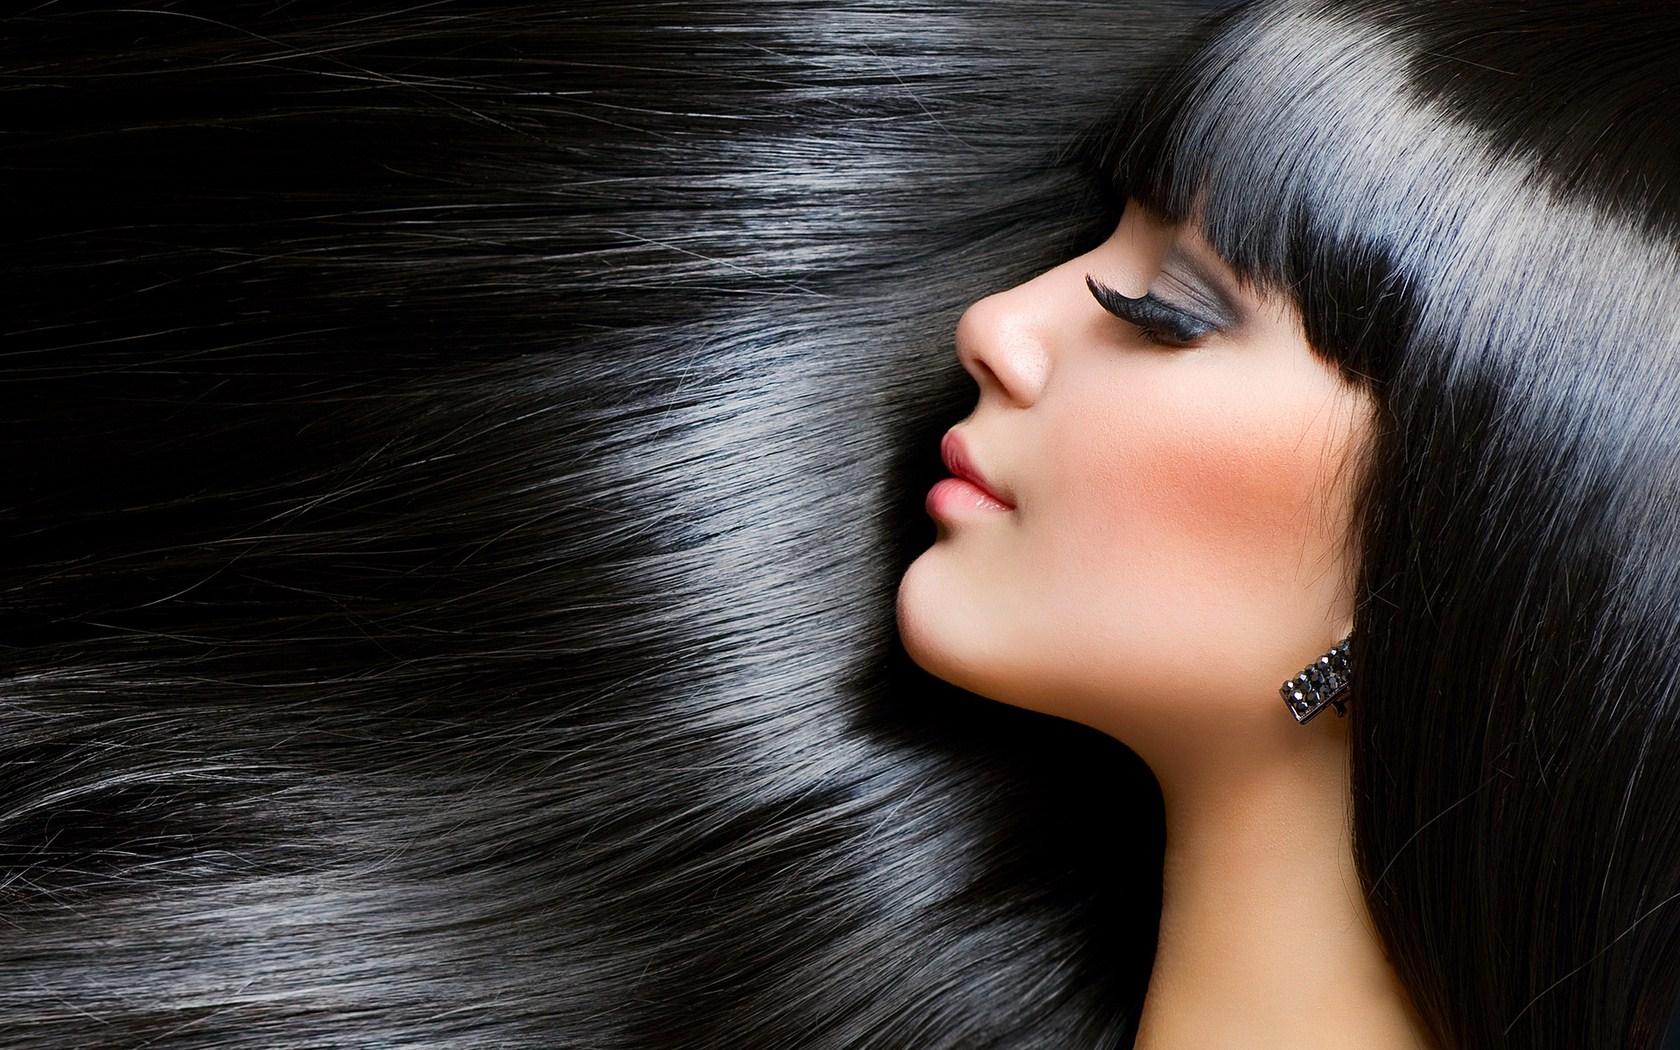 portrait-brunette-girl-beautiful-hair-wallpaper-1680x1050.jpg